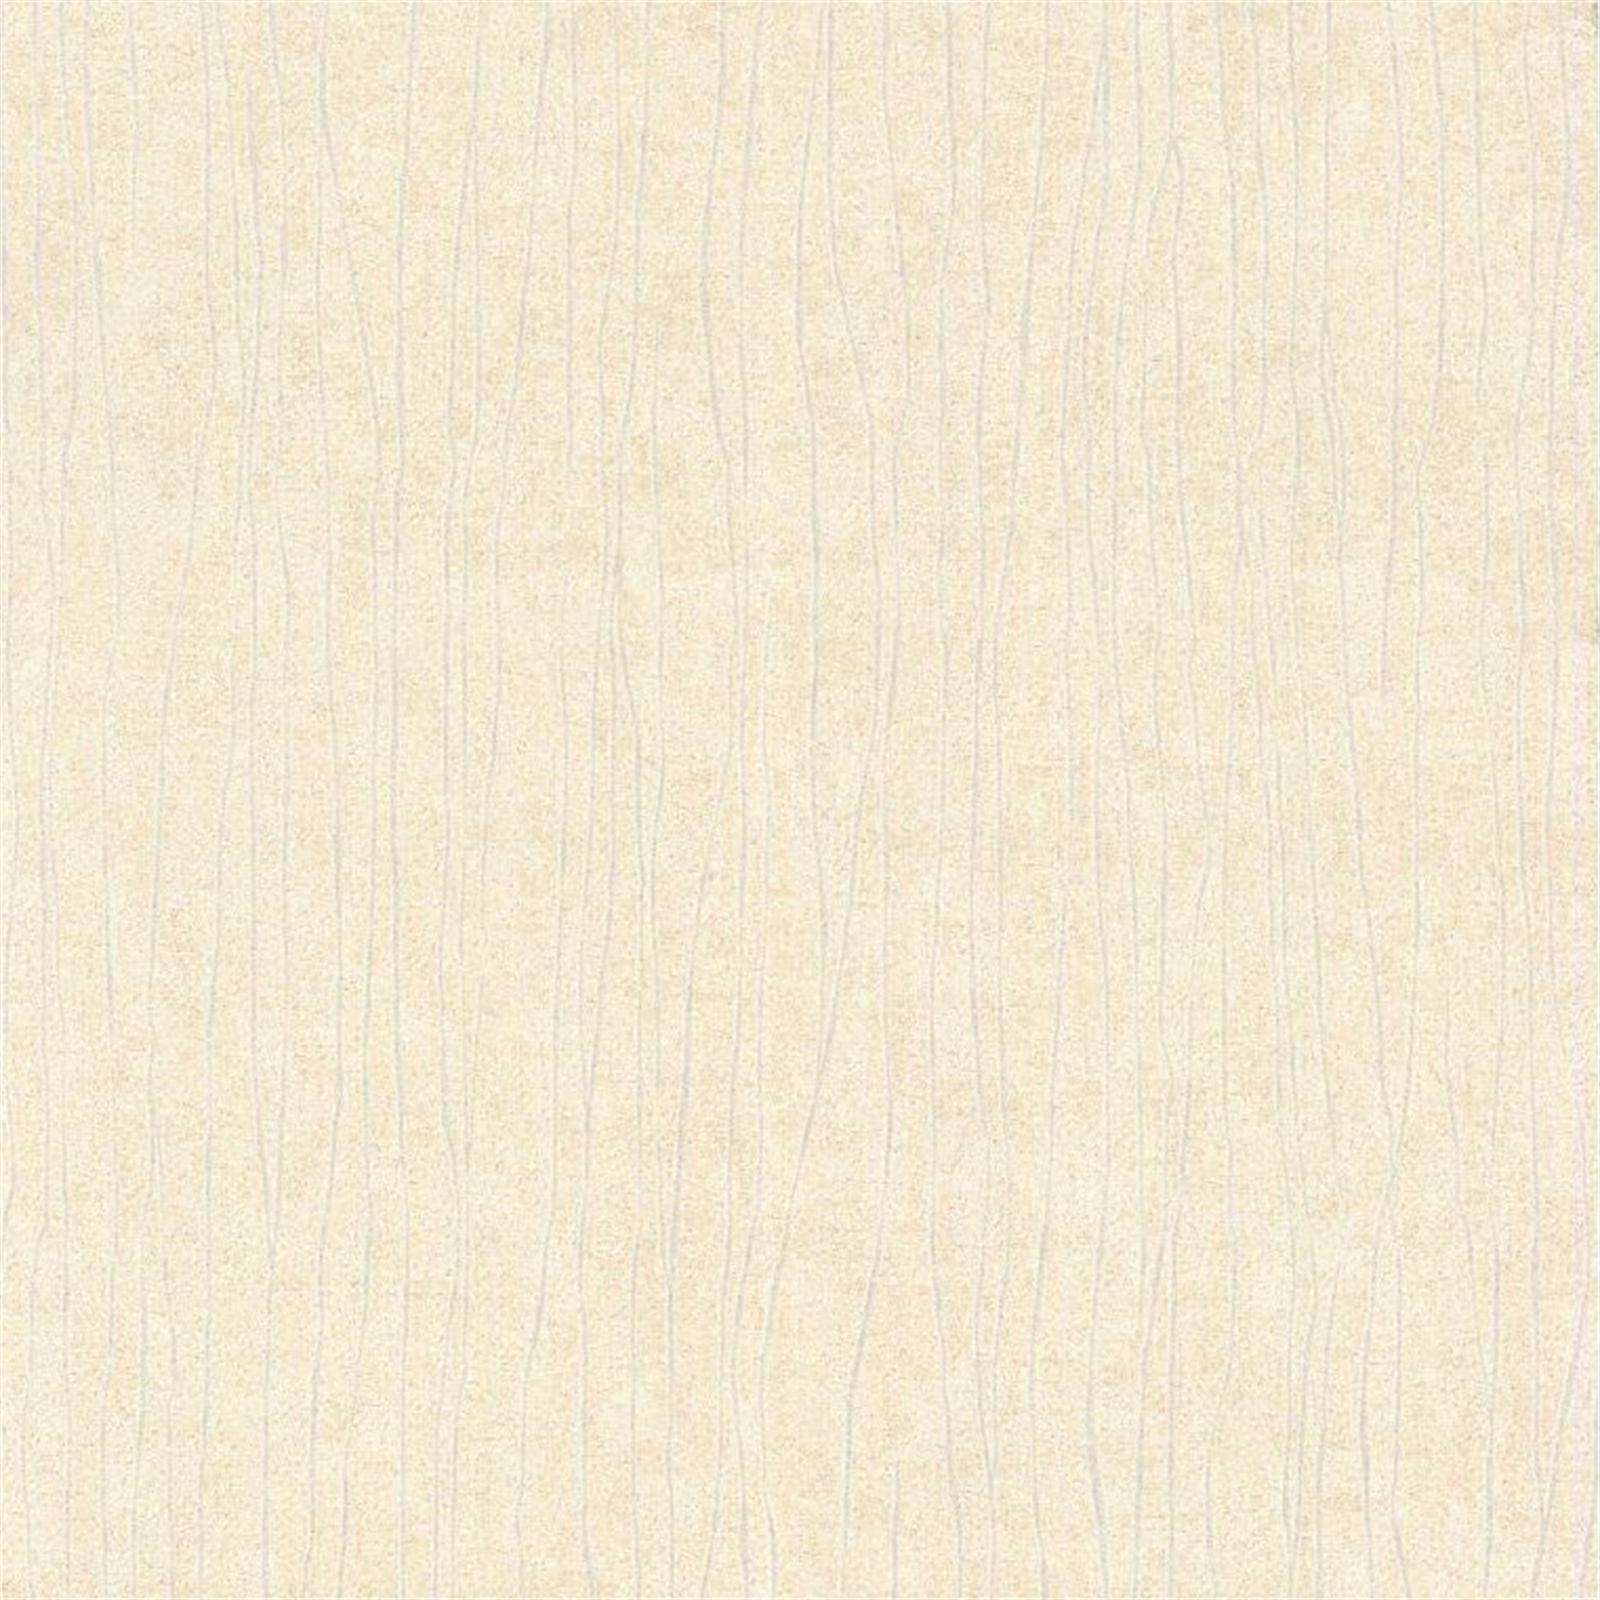 Superfresco Easy Beige Spunsilk Wallpaper - Beige Spunsilk ½m